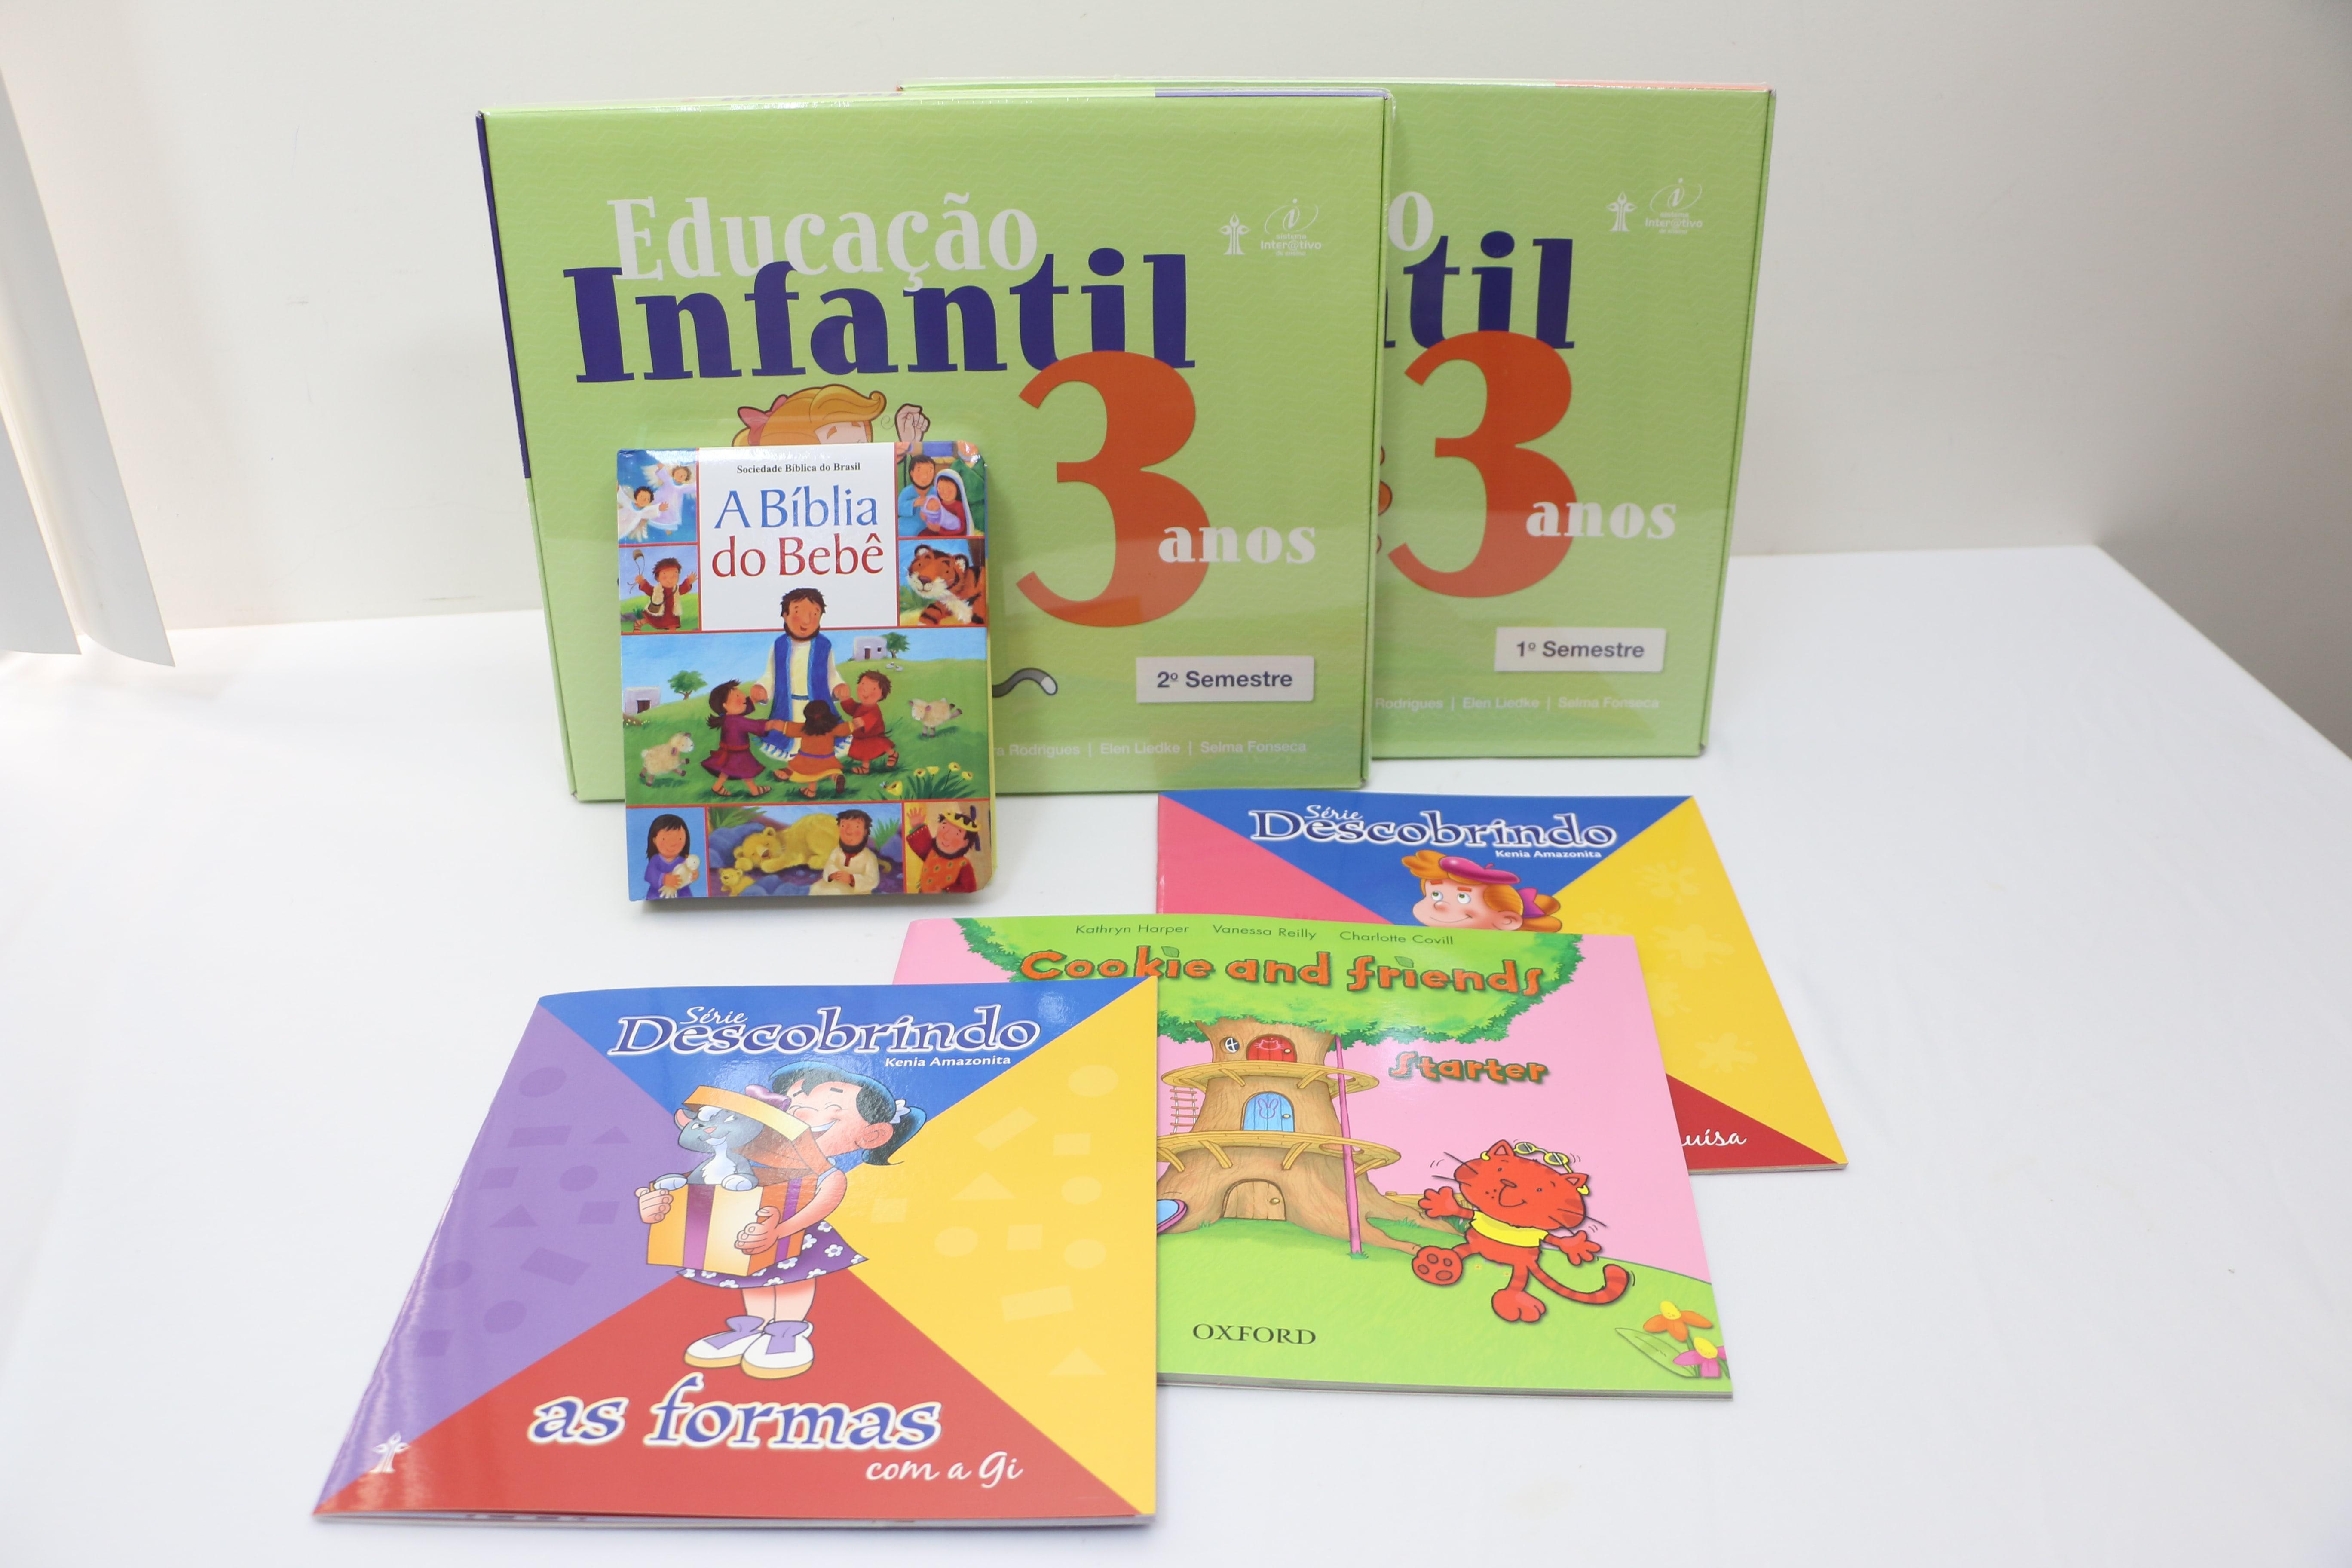 KIT MATERNAL II - EDUCAÇÃO INFANTIL